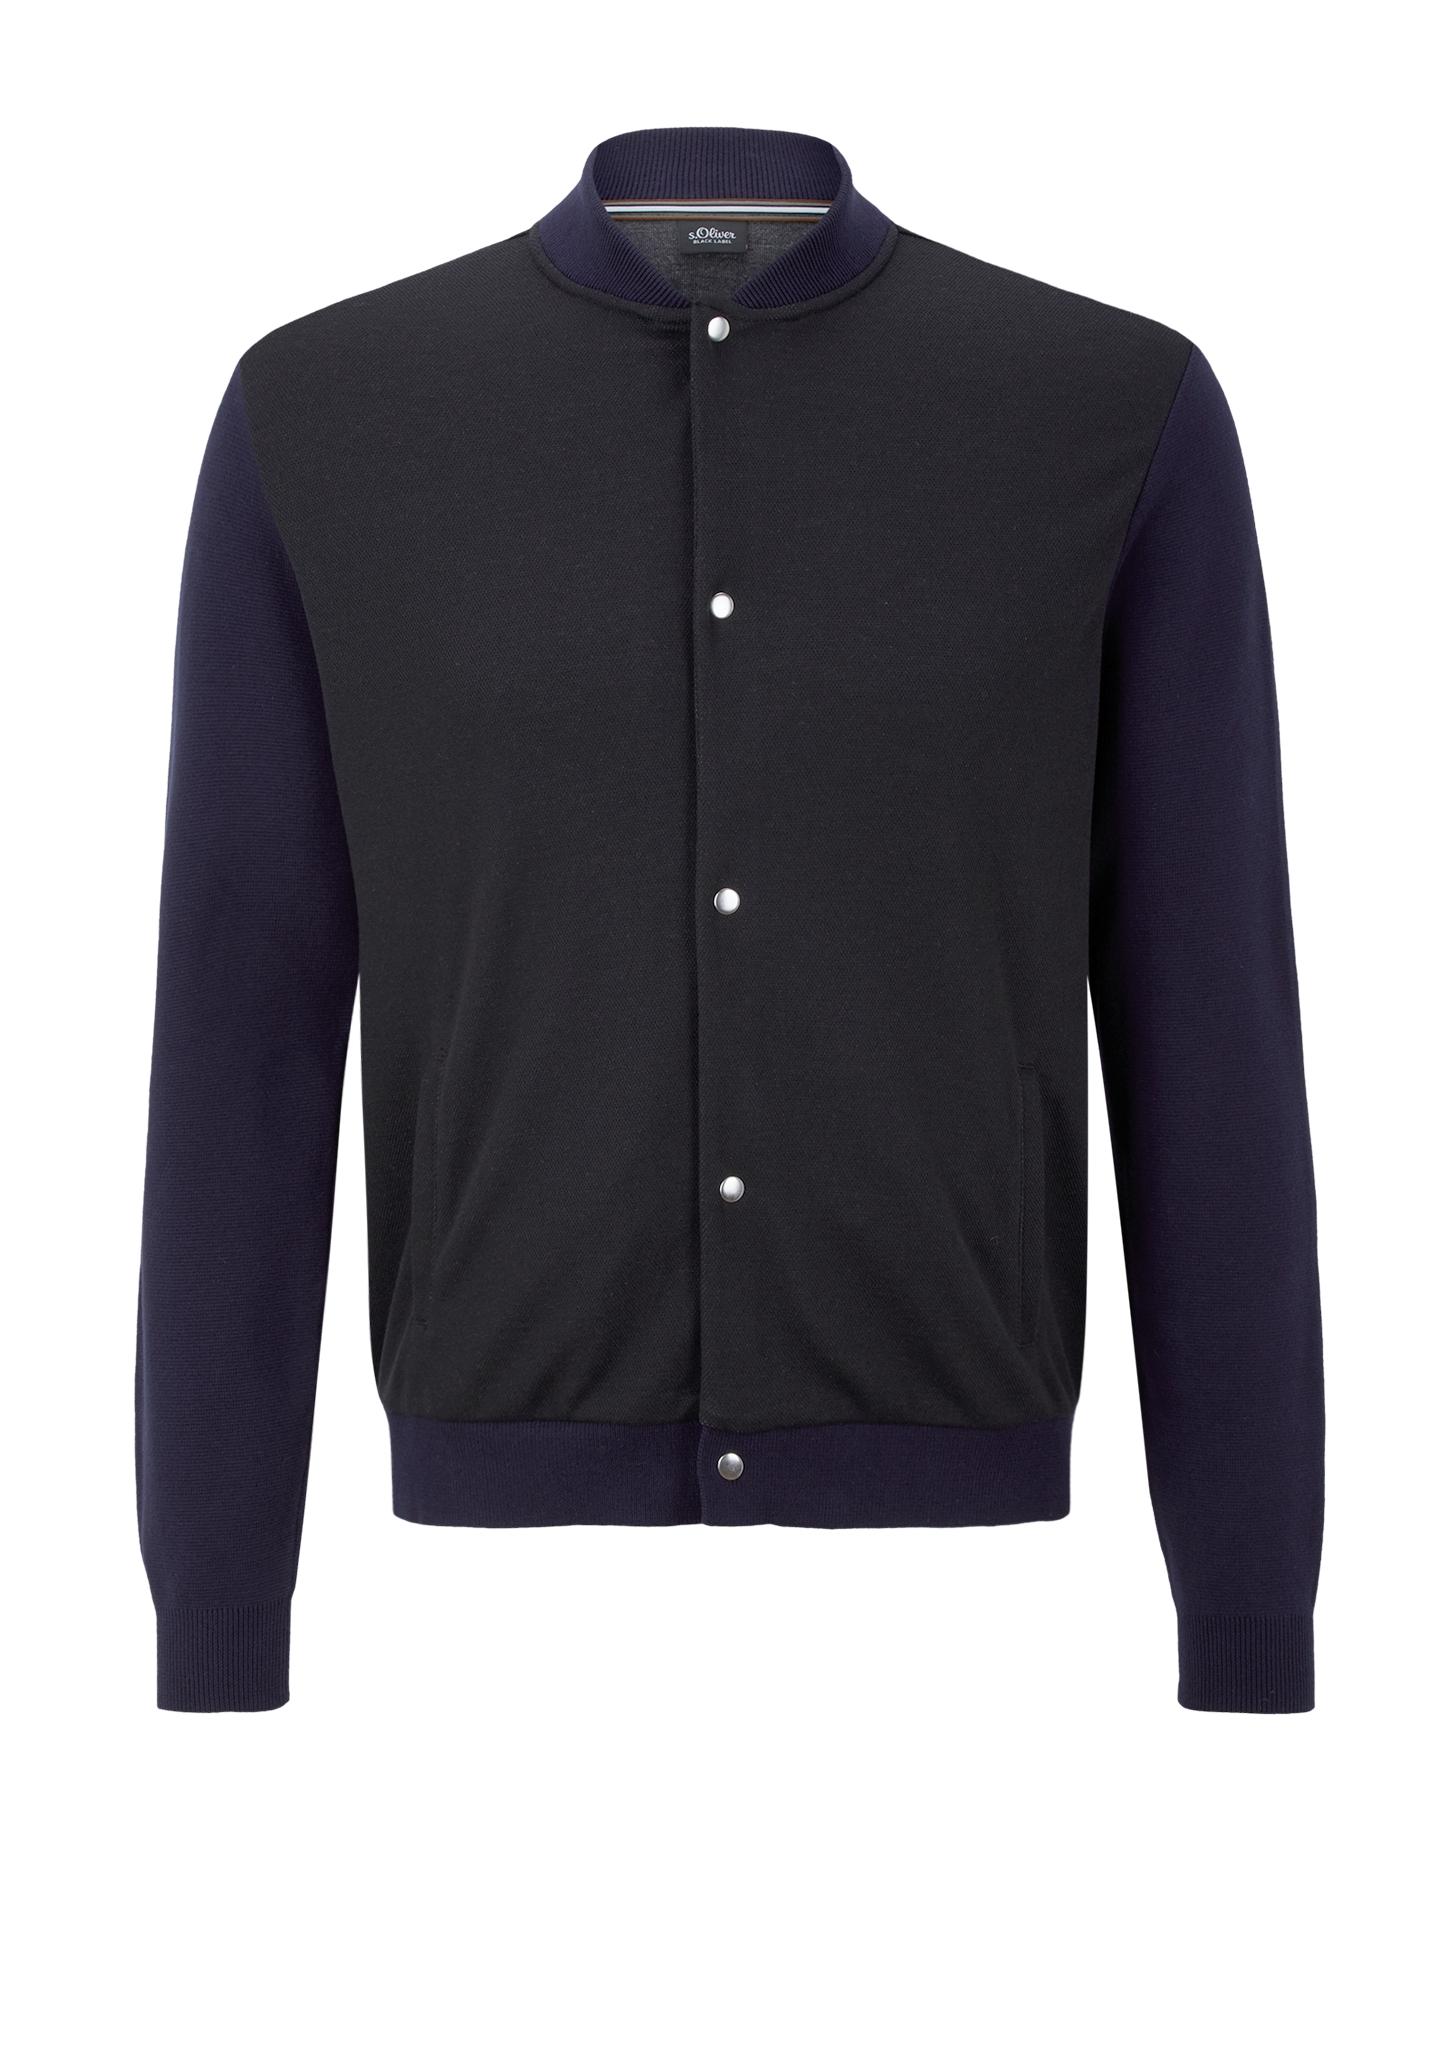 Bomber-Cardigan   Bekleidung > Strickjacken & Cardigans   Grau/schwarz   Obermaterial 85% polyester -  15% viskose  garn 100% baumwolle   s.Oliver BLACK LABEL